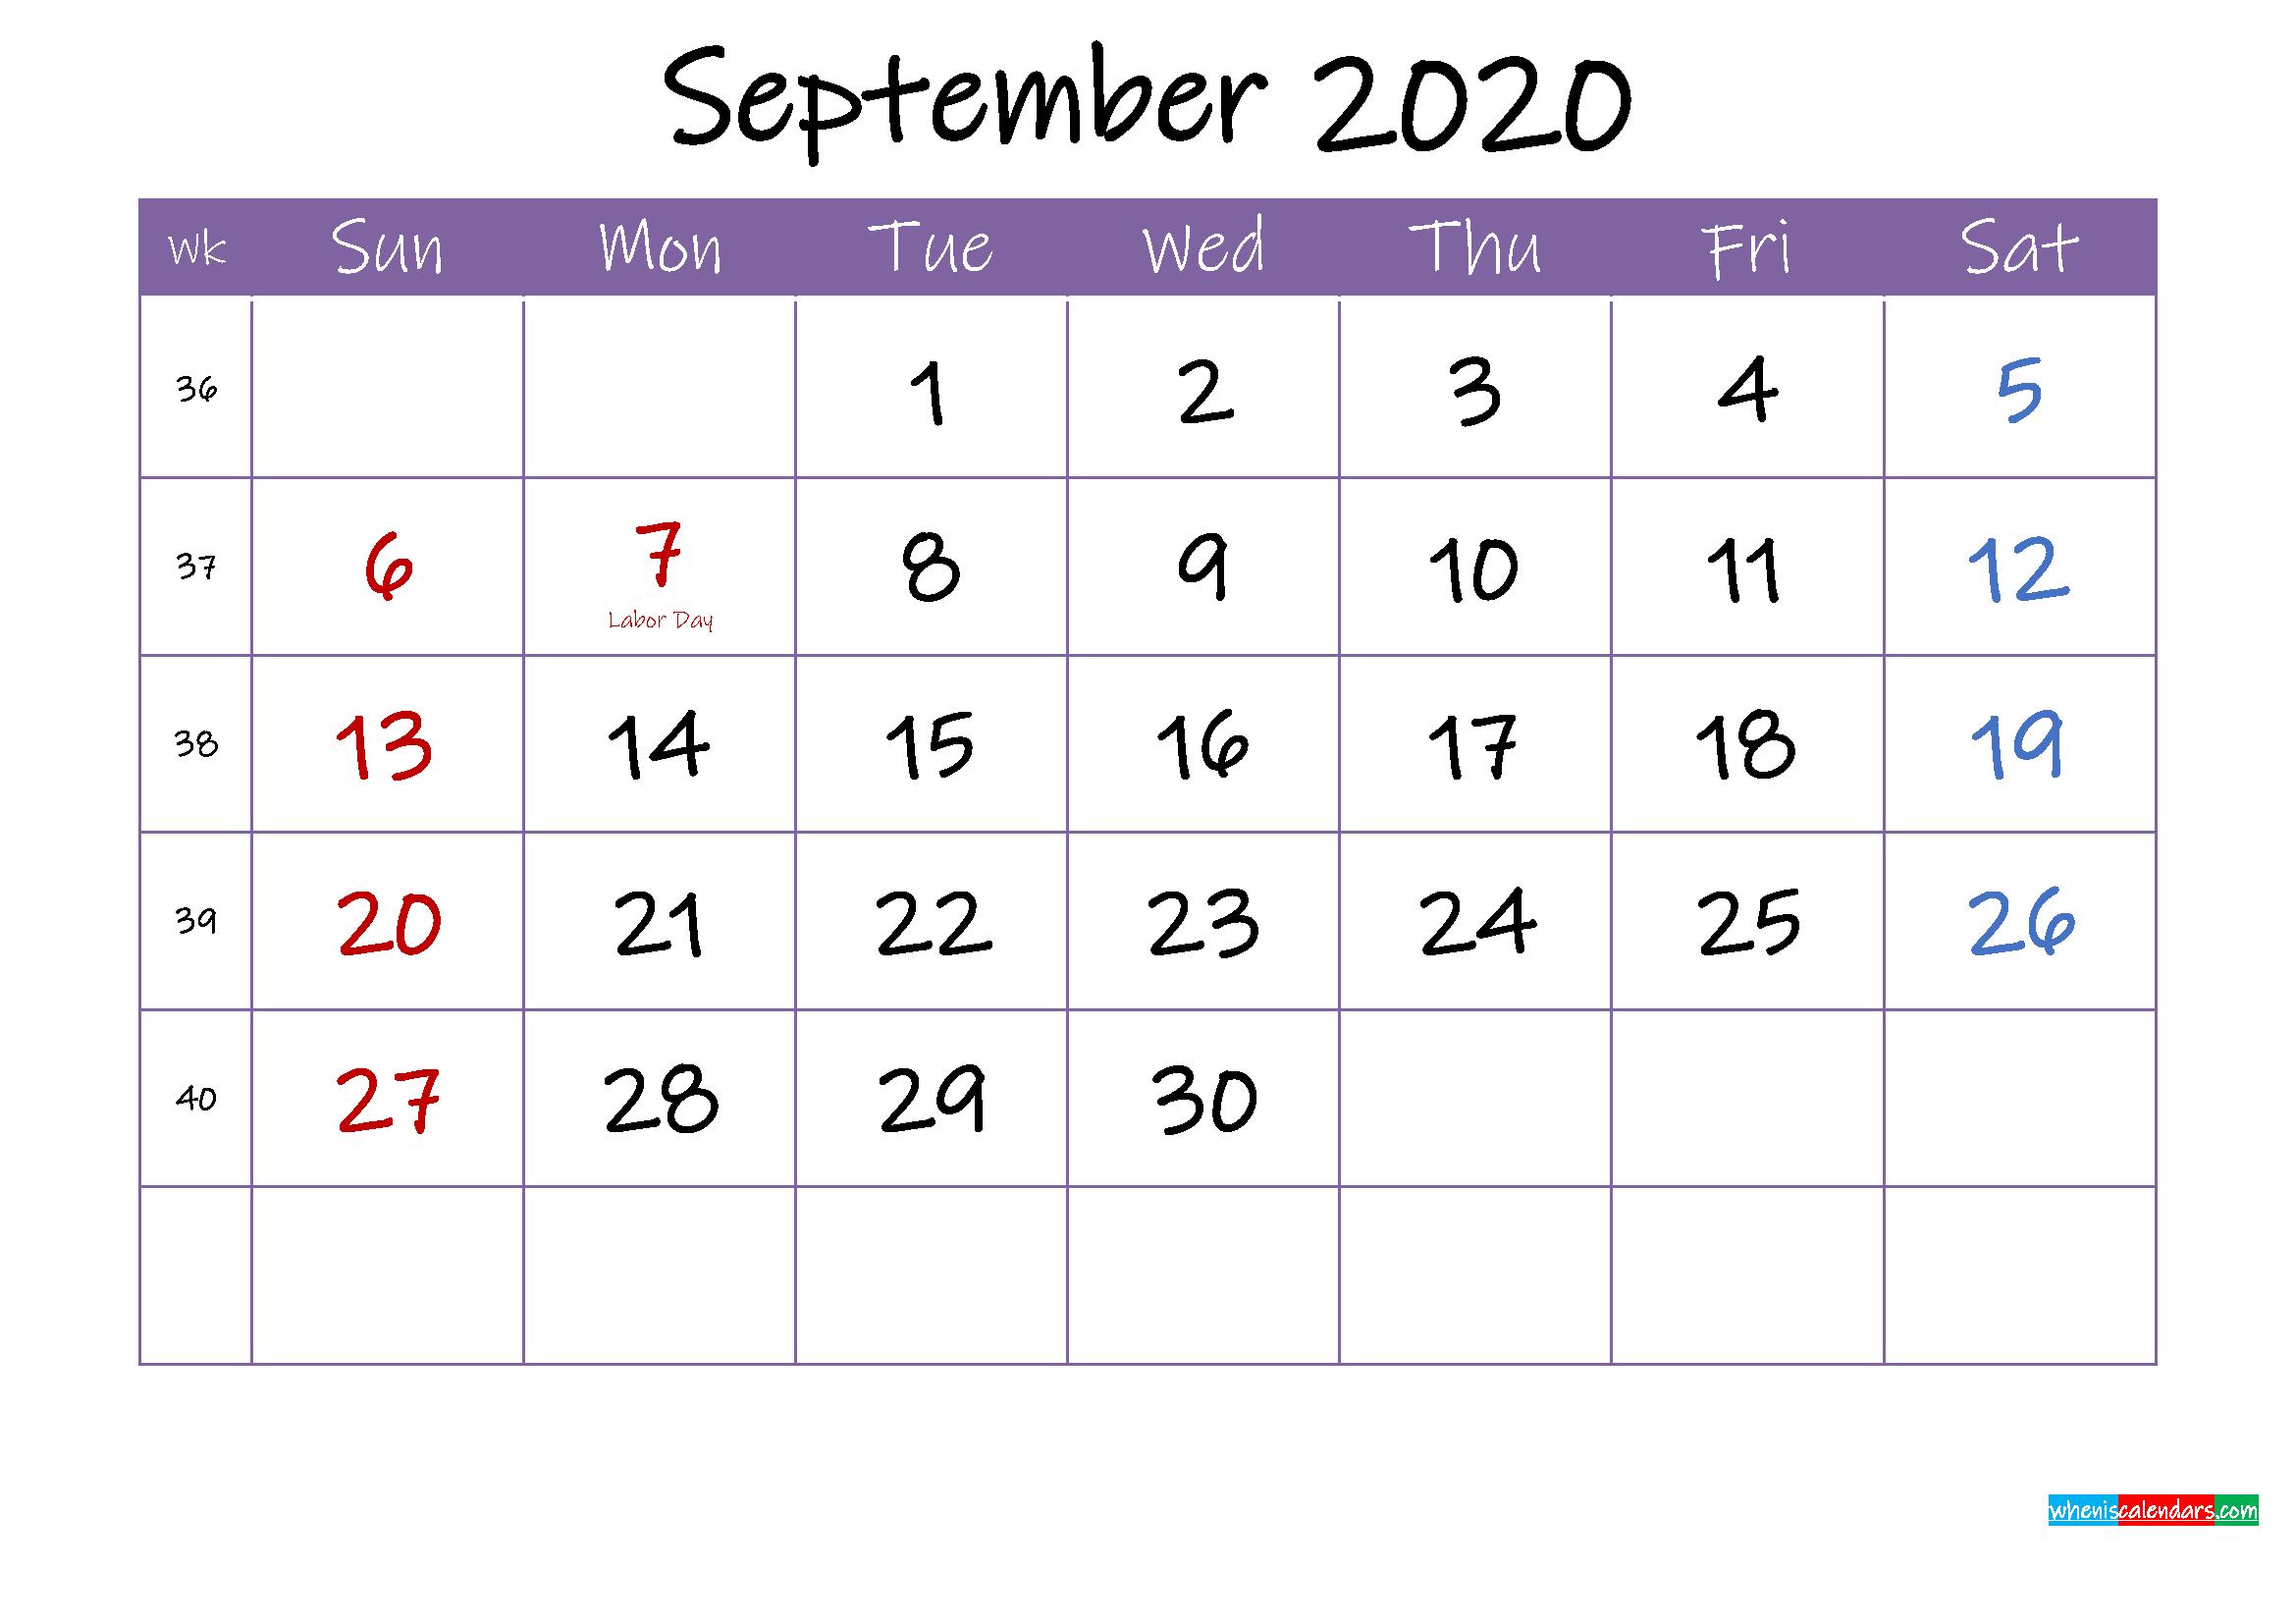 September 2020 Calendar with Holidays Printable